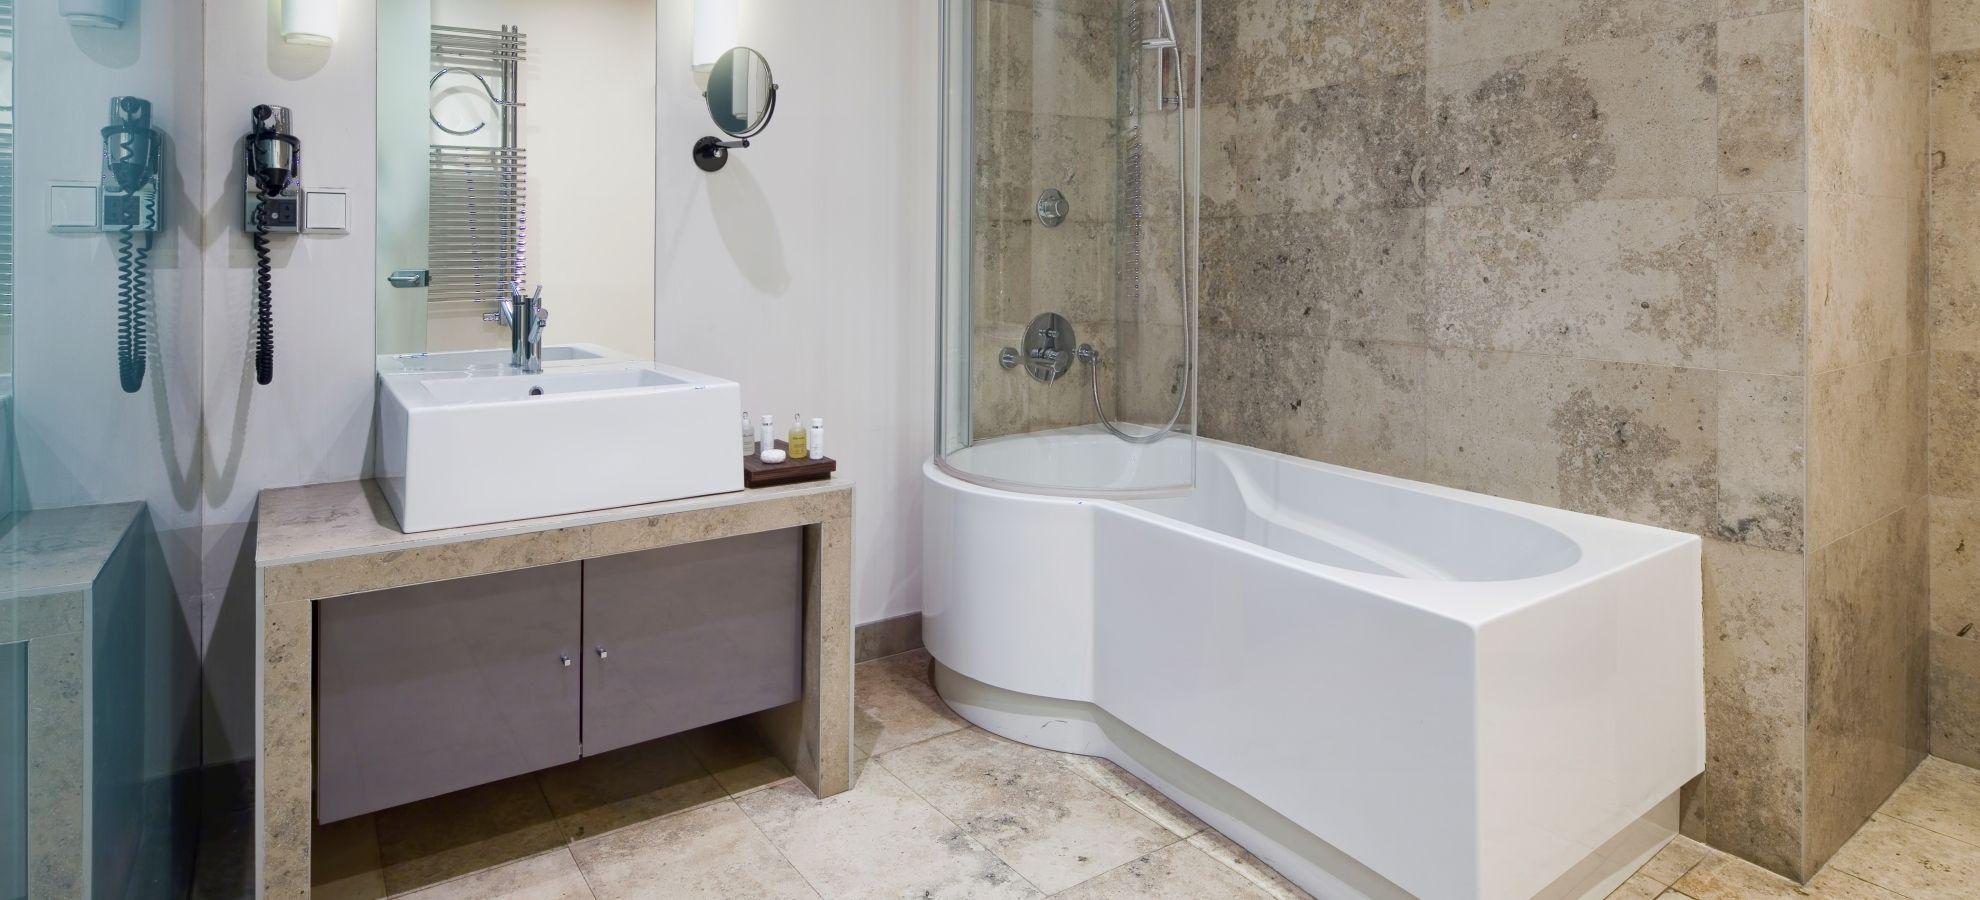 Mamaison-Hotel-Pokrovka-Moscow-Chairman-Suite-Bathroom.jpg